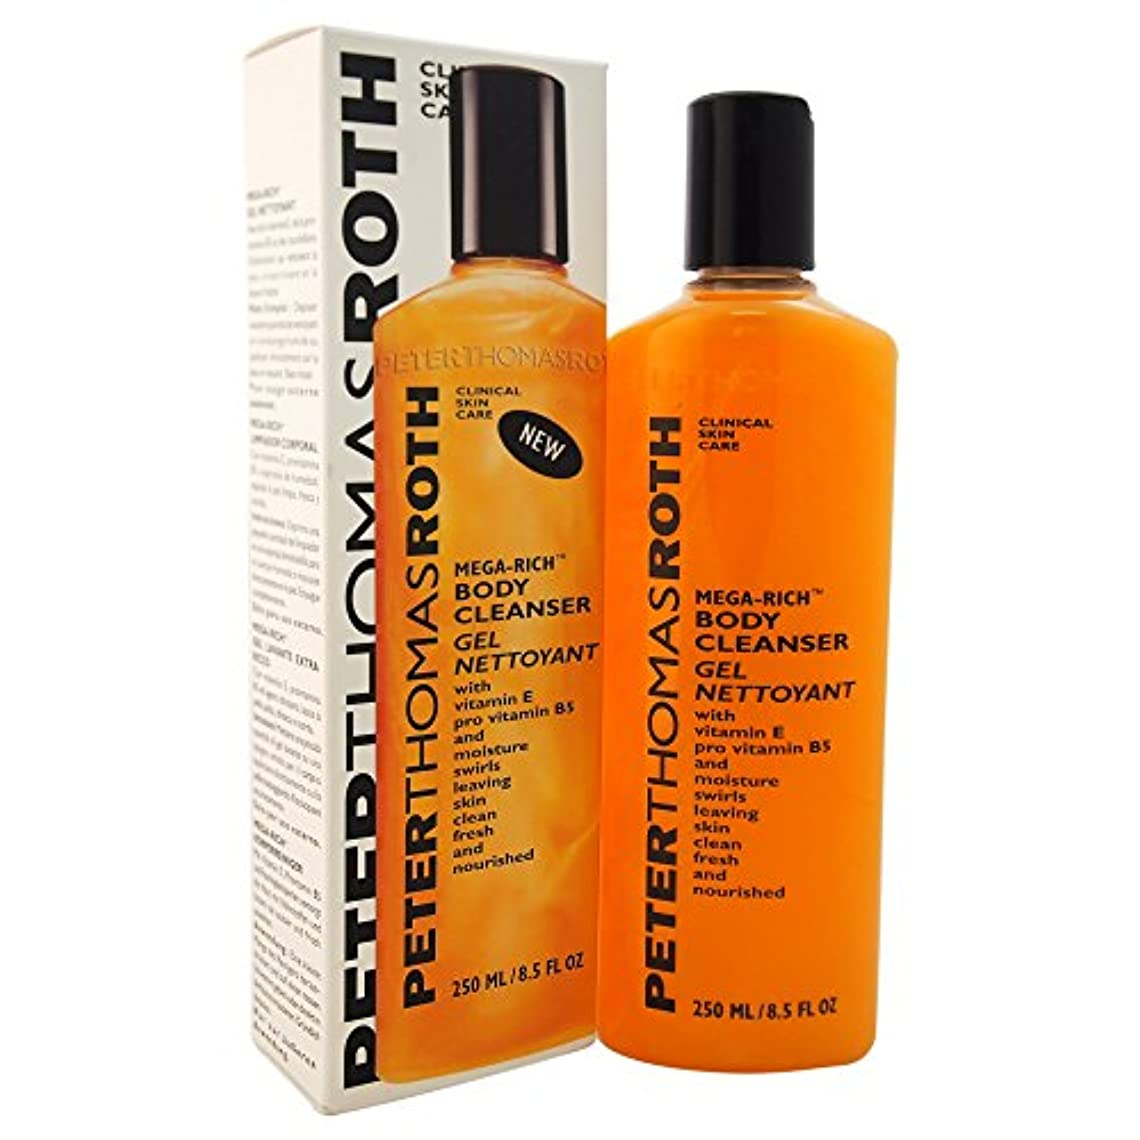 Peter Thomas Roth Mega-Rich Body Cleanser Gel (並行輸入品) [並行輸入品]